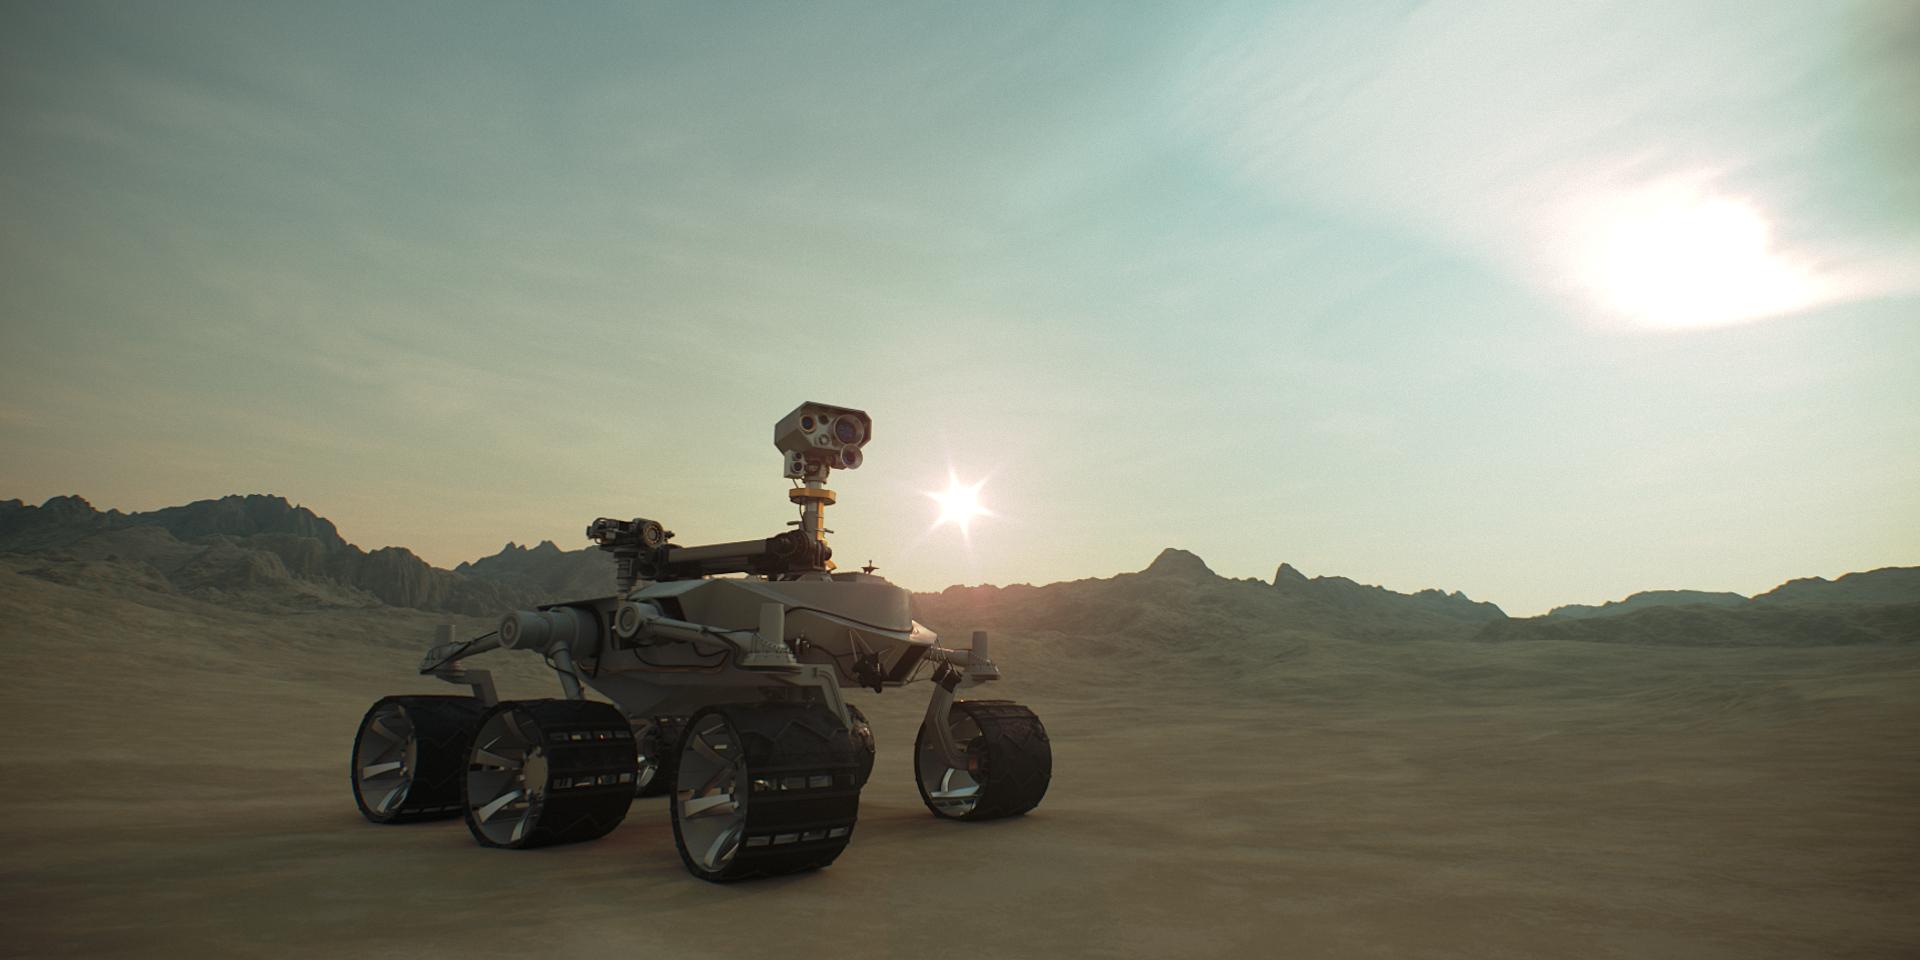 Rover Scene Alien Skies 05 Camera A.jpg